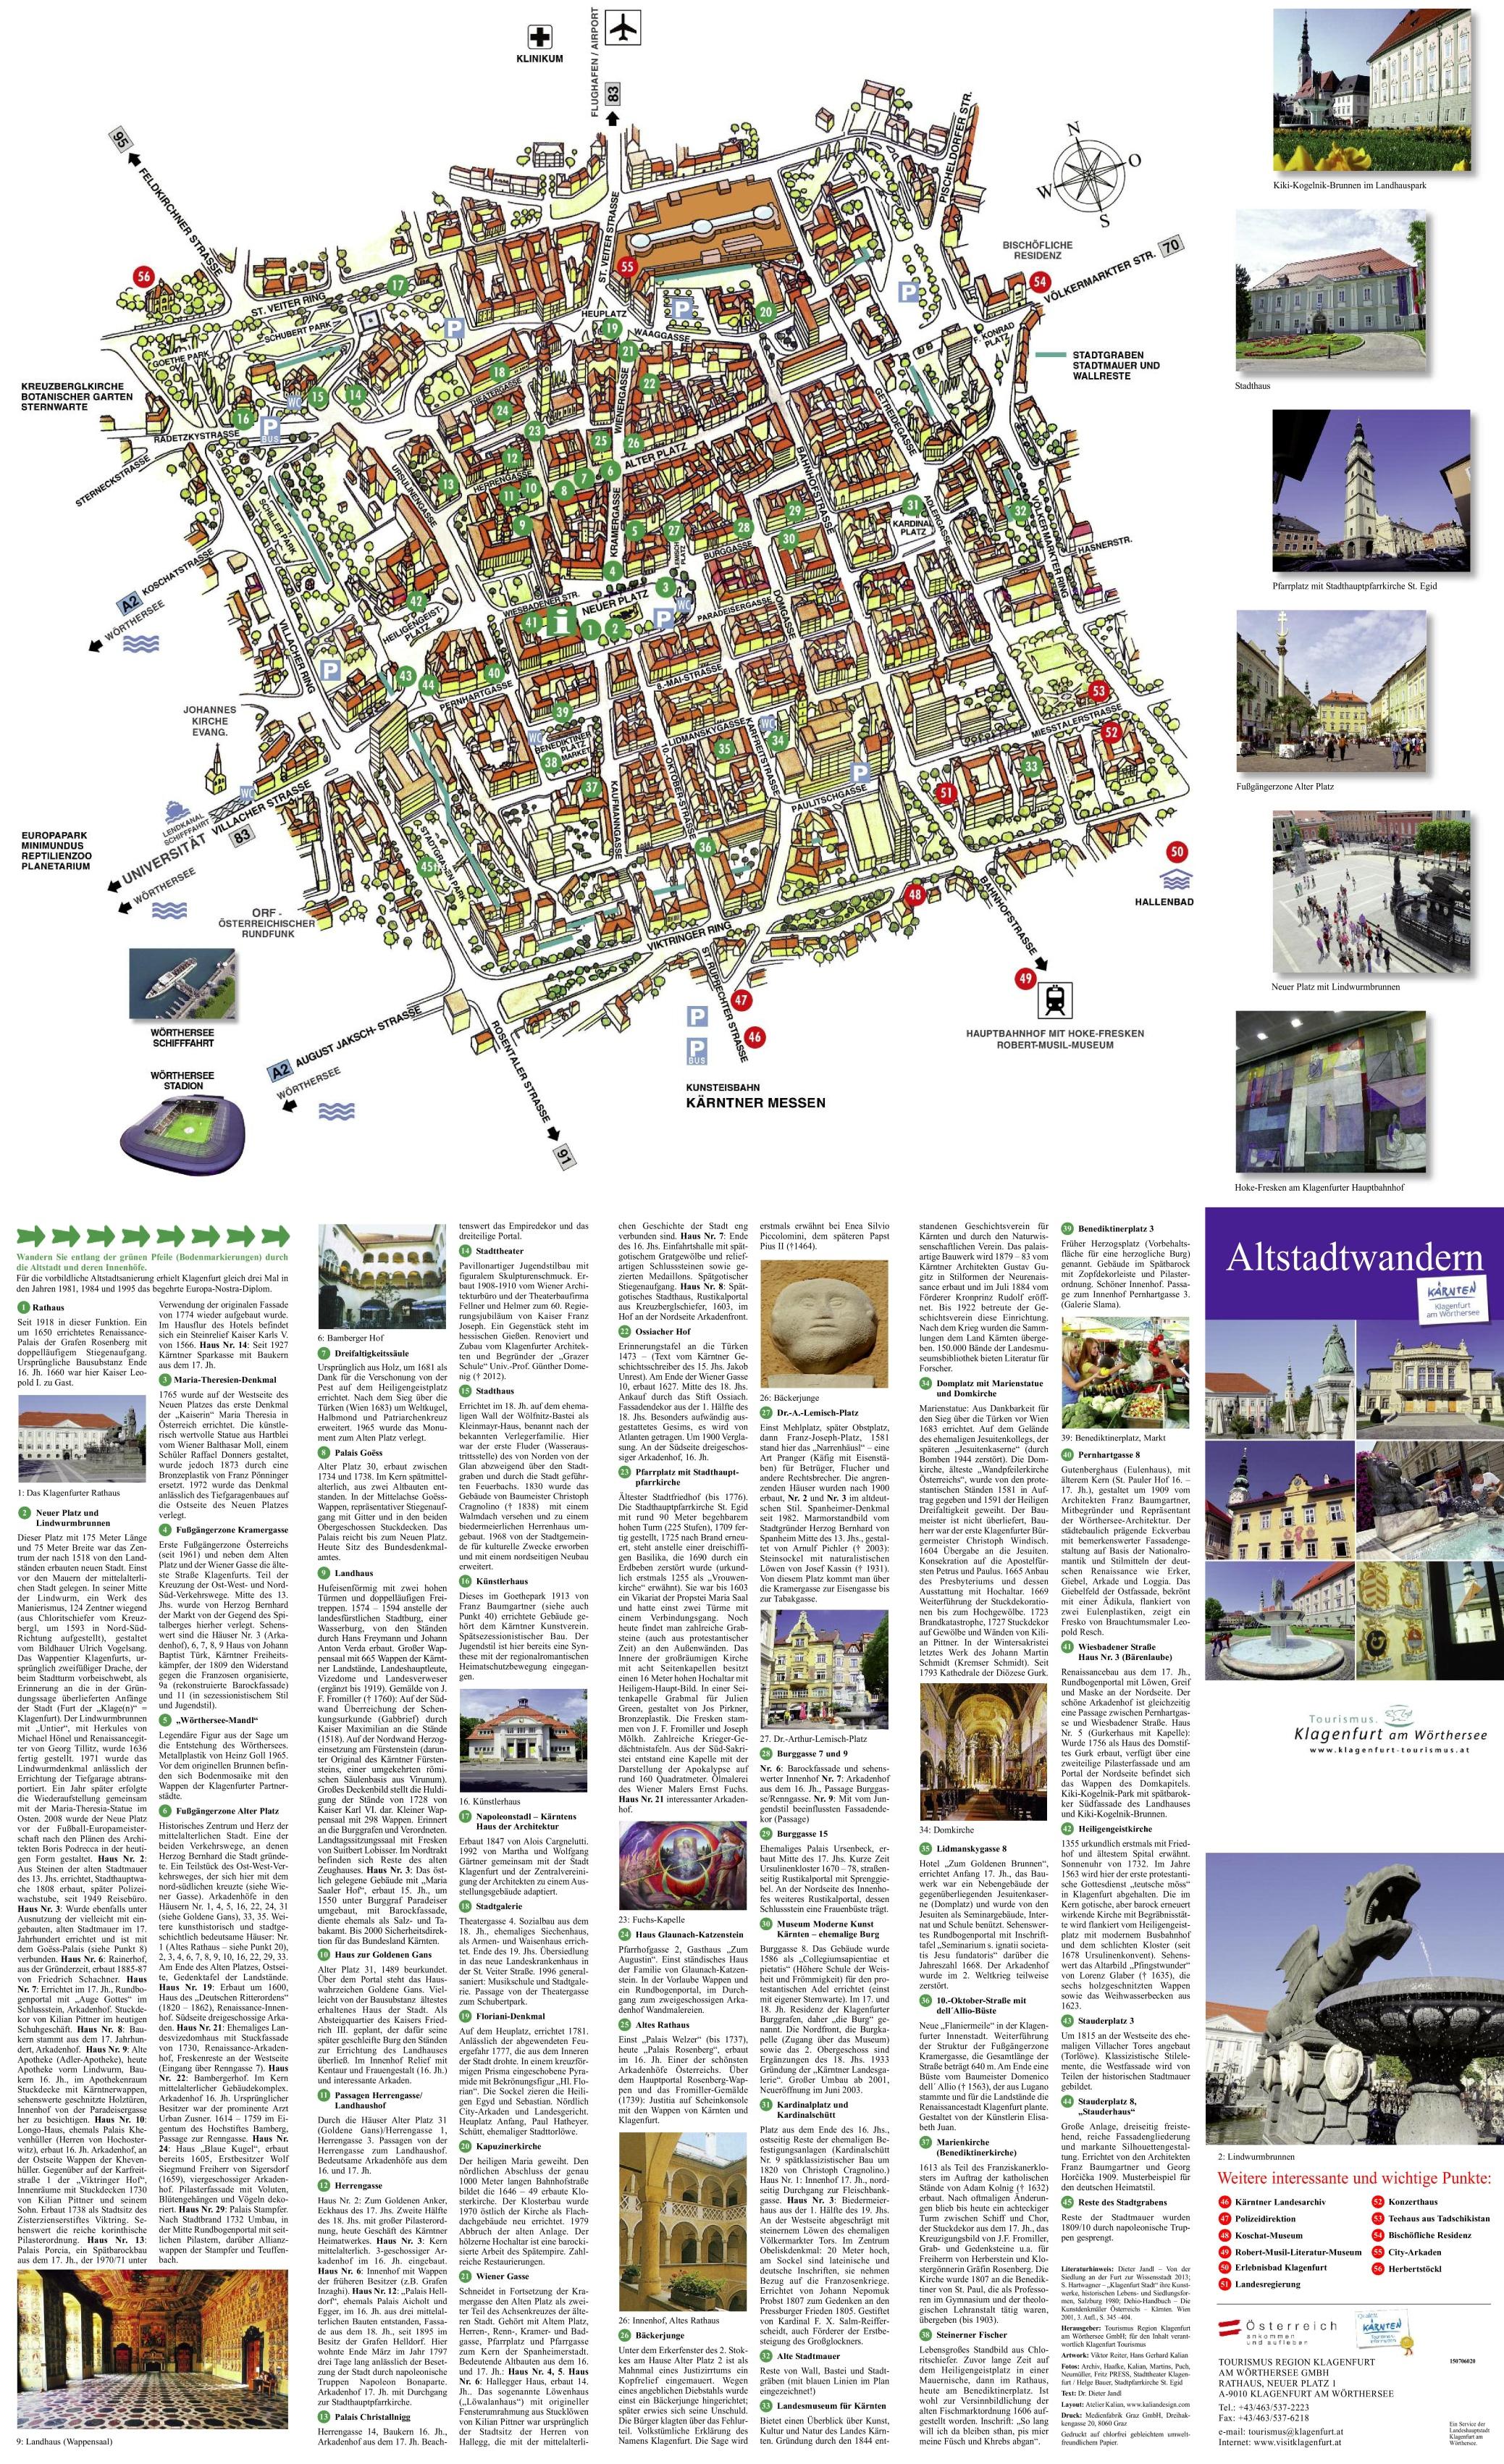 Klagenfurt Maps Austria Maps Of Klagenfurt Am Wörthersee - Klagenfurt austria map